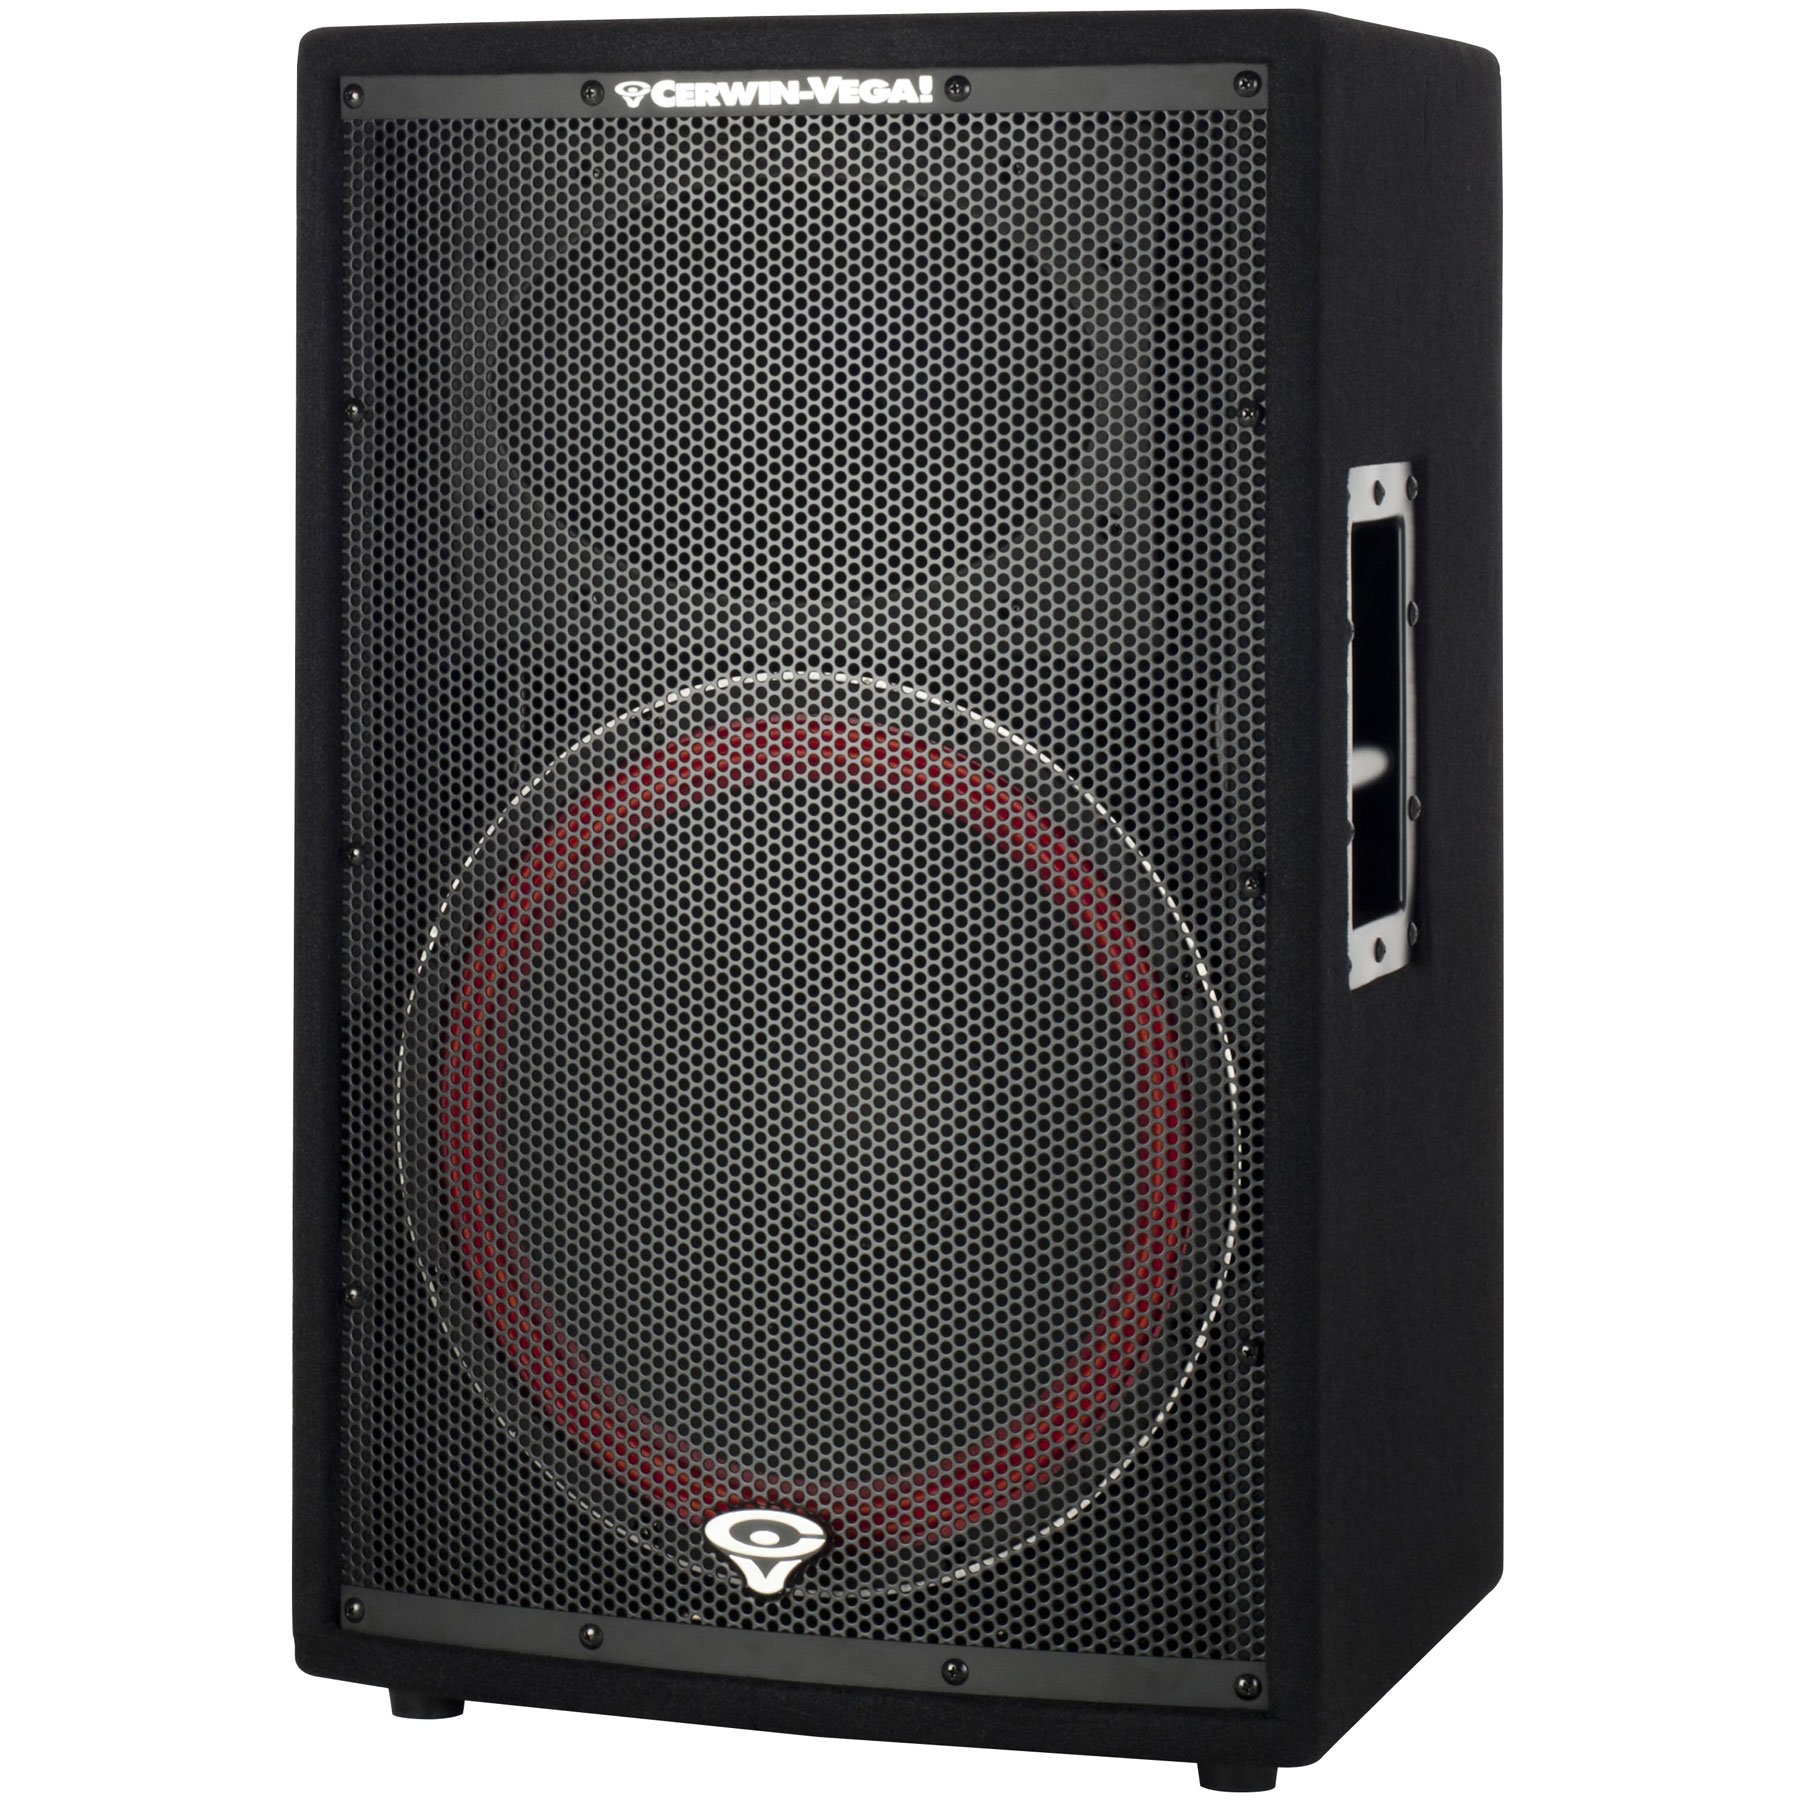 Cerwin-Vega CVI152 1000-Watts 1 x 15 Inches Passive 2-Way Loudspeaker